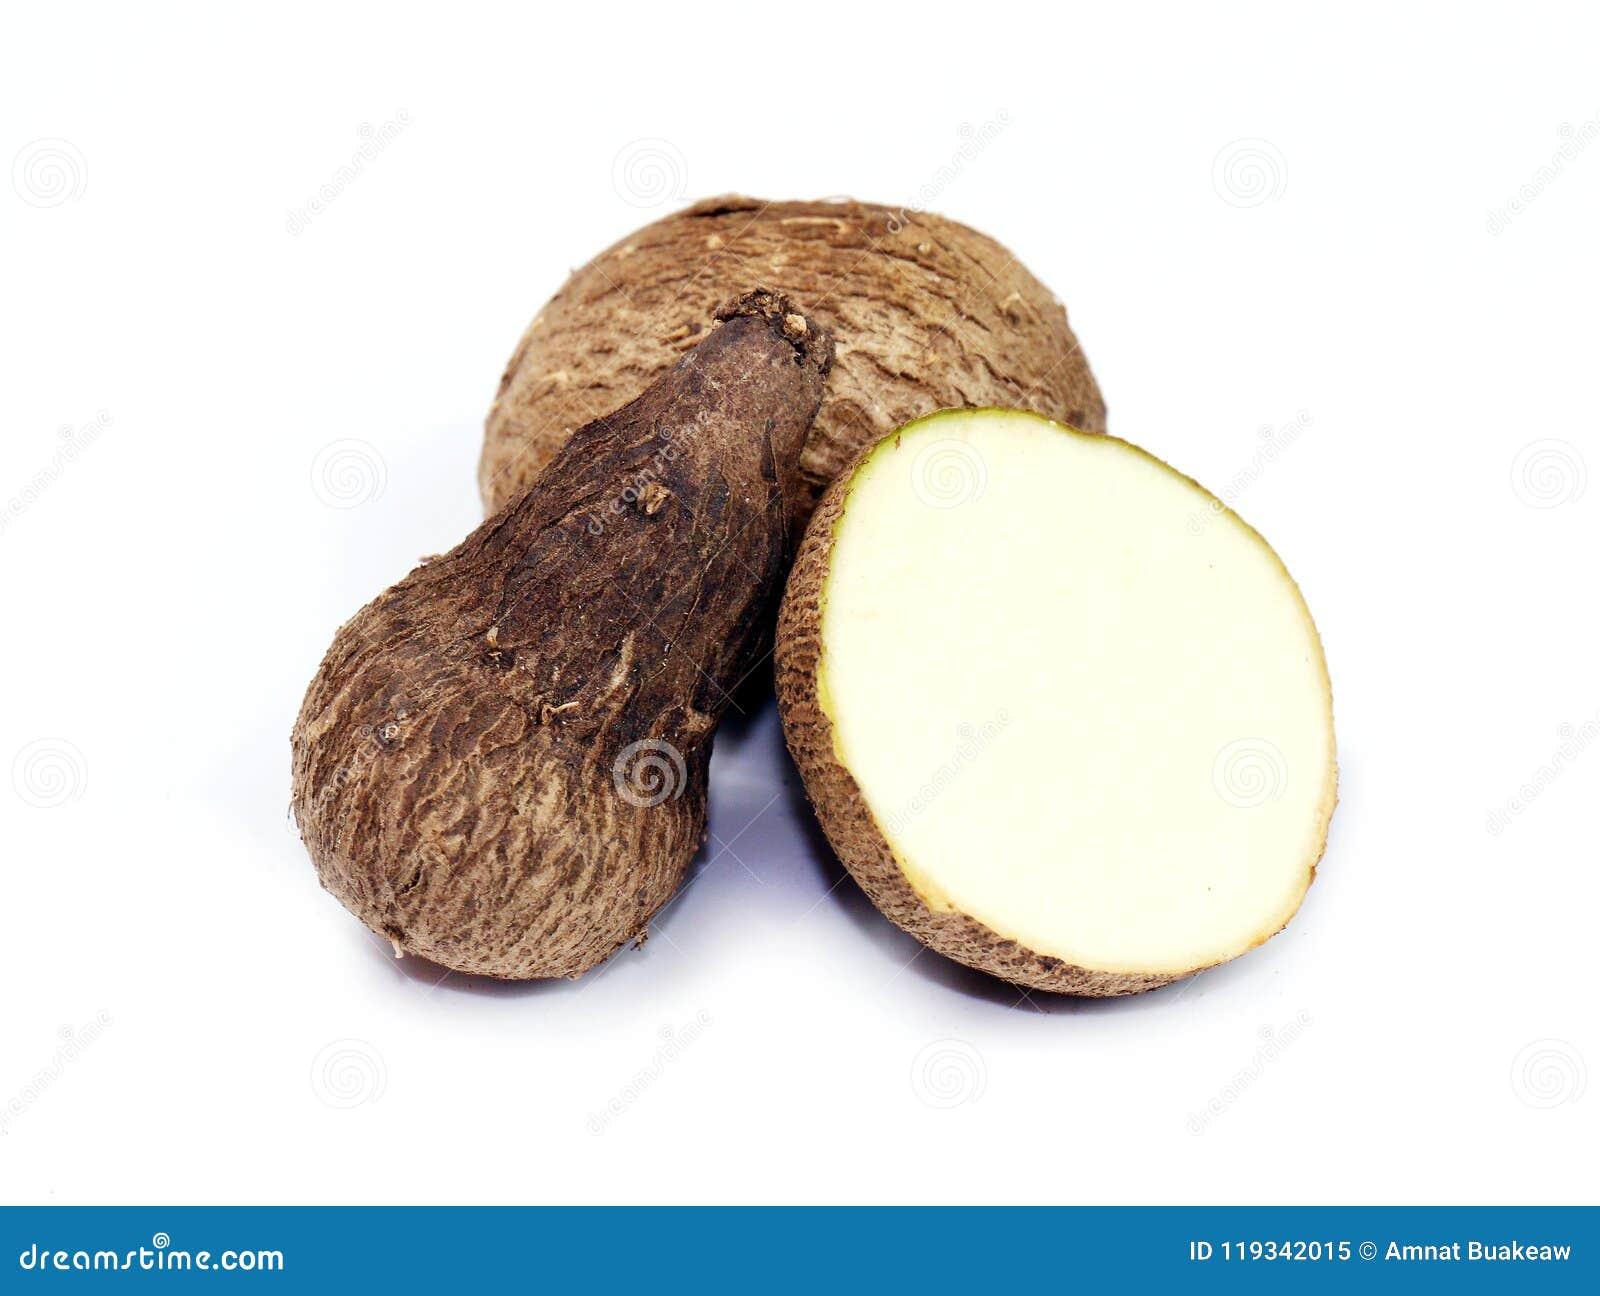 Dioscorea, Mun-Neb Thai word, Fresh Dioscorea tuck, Dioscorea slats root on white background, Rubeola fotografie